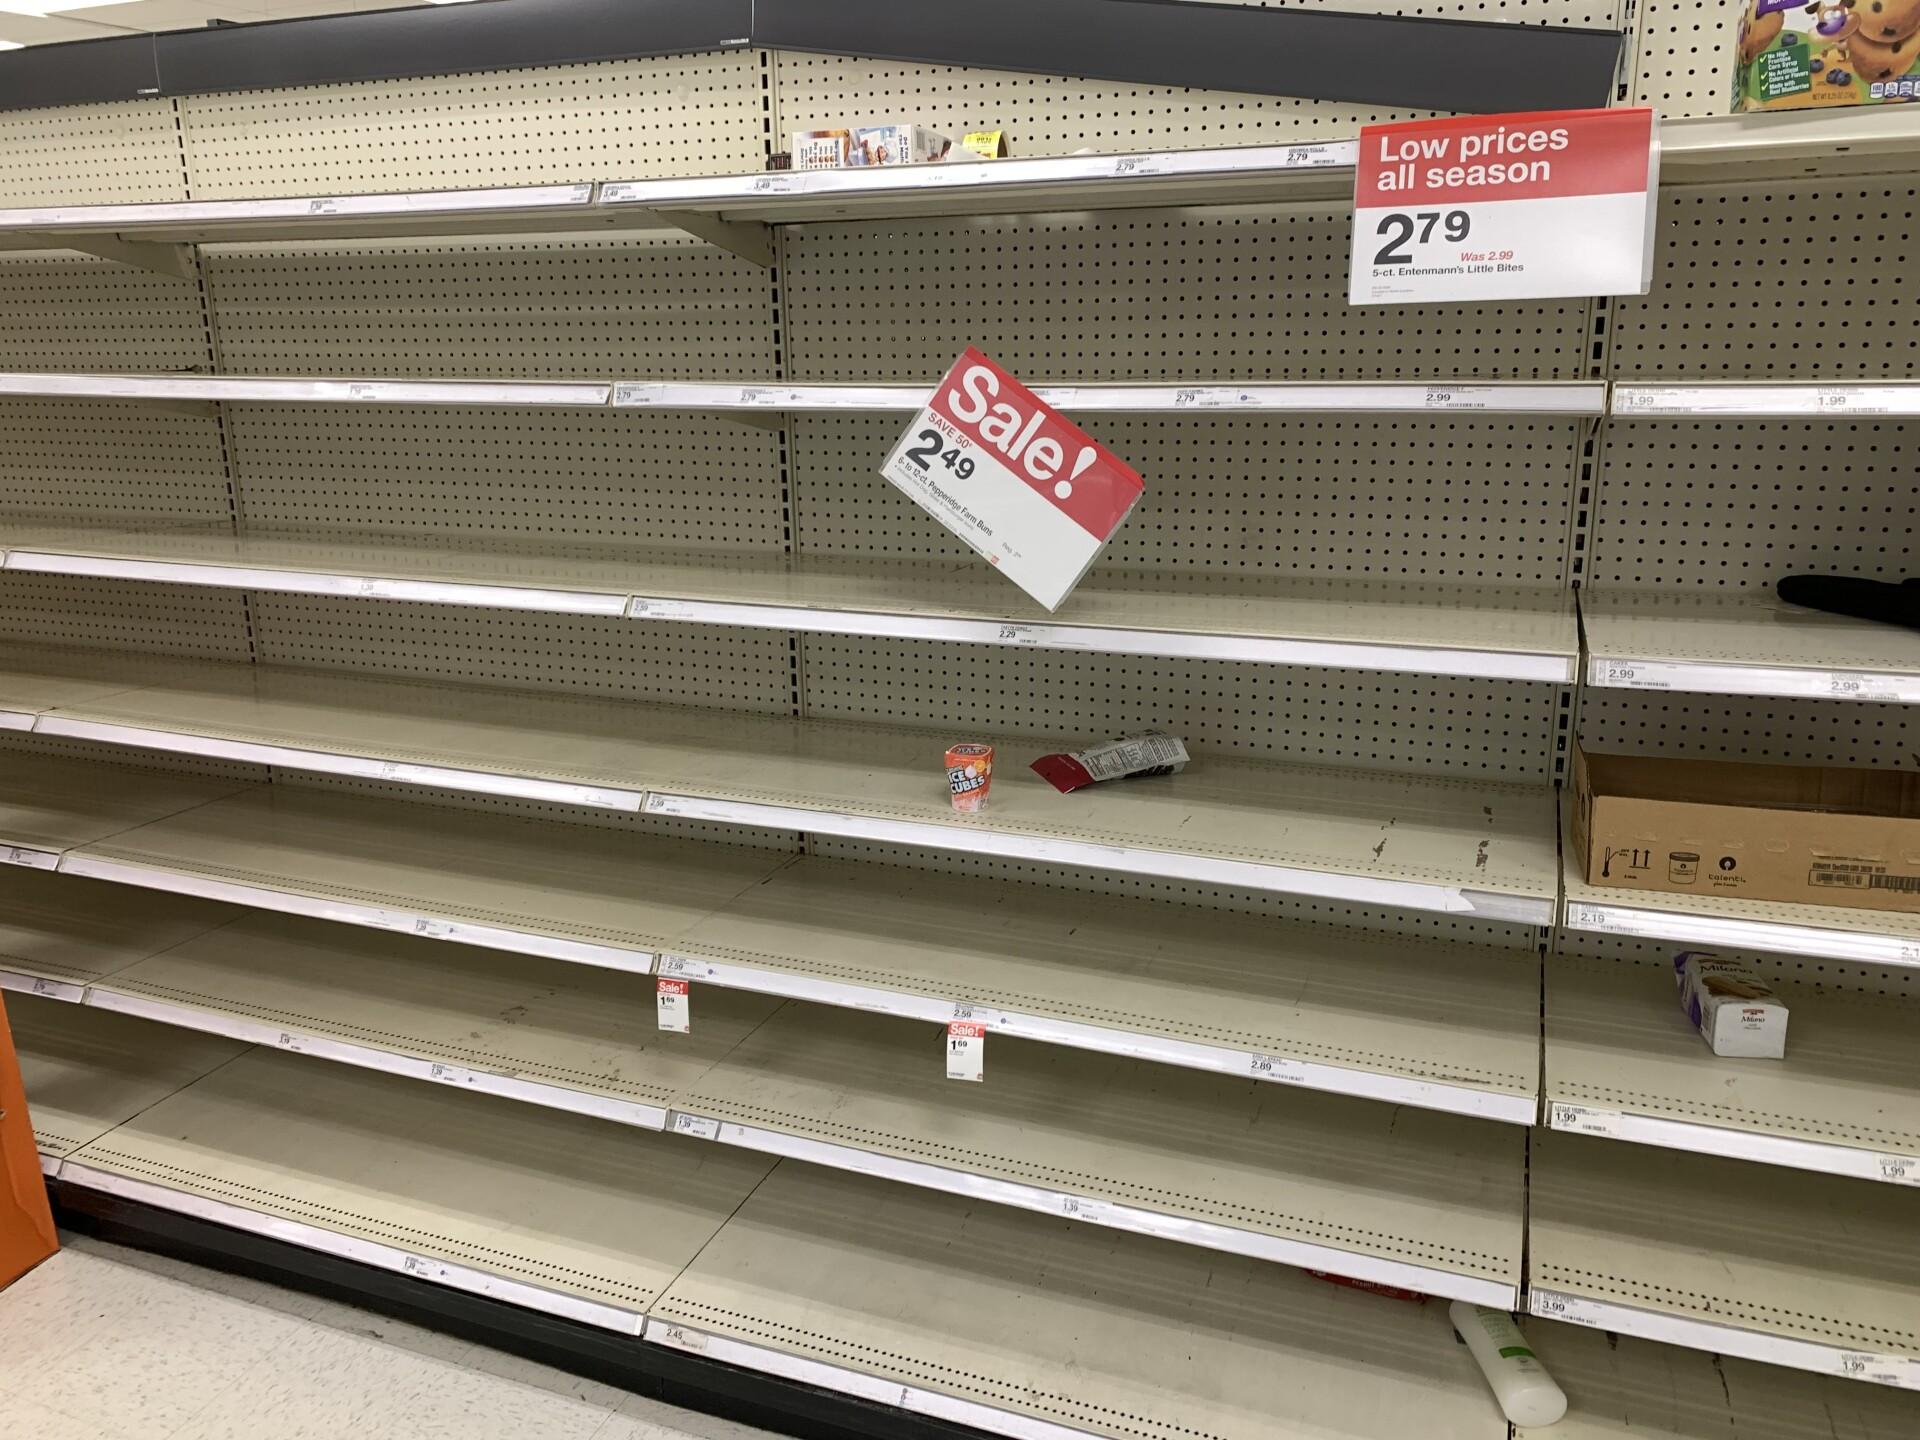 Bread shelves at a Metairie, Louisiana Target